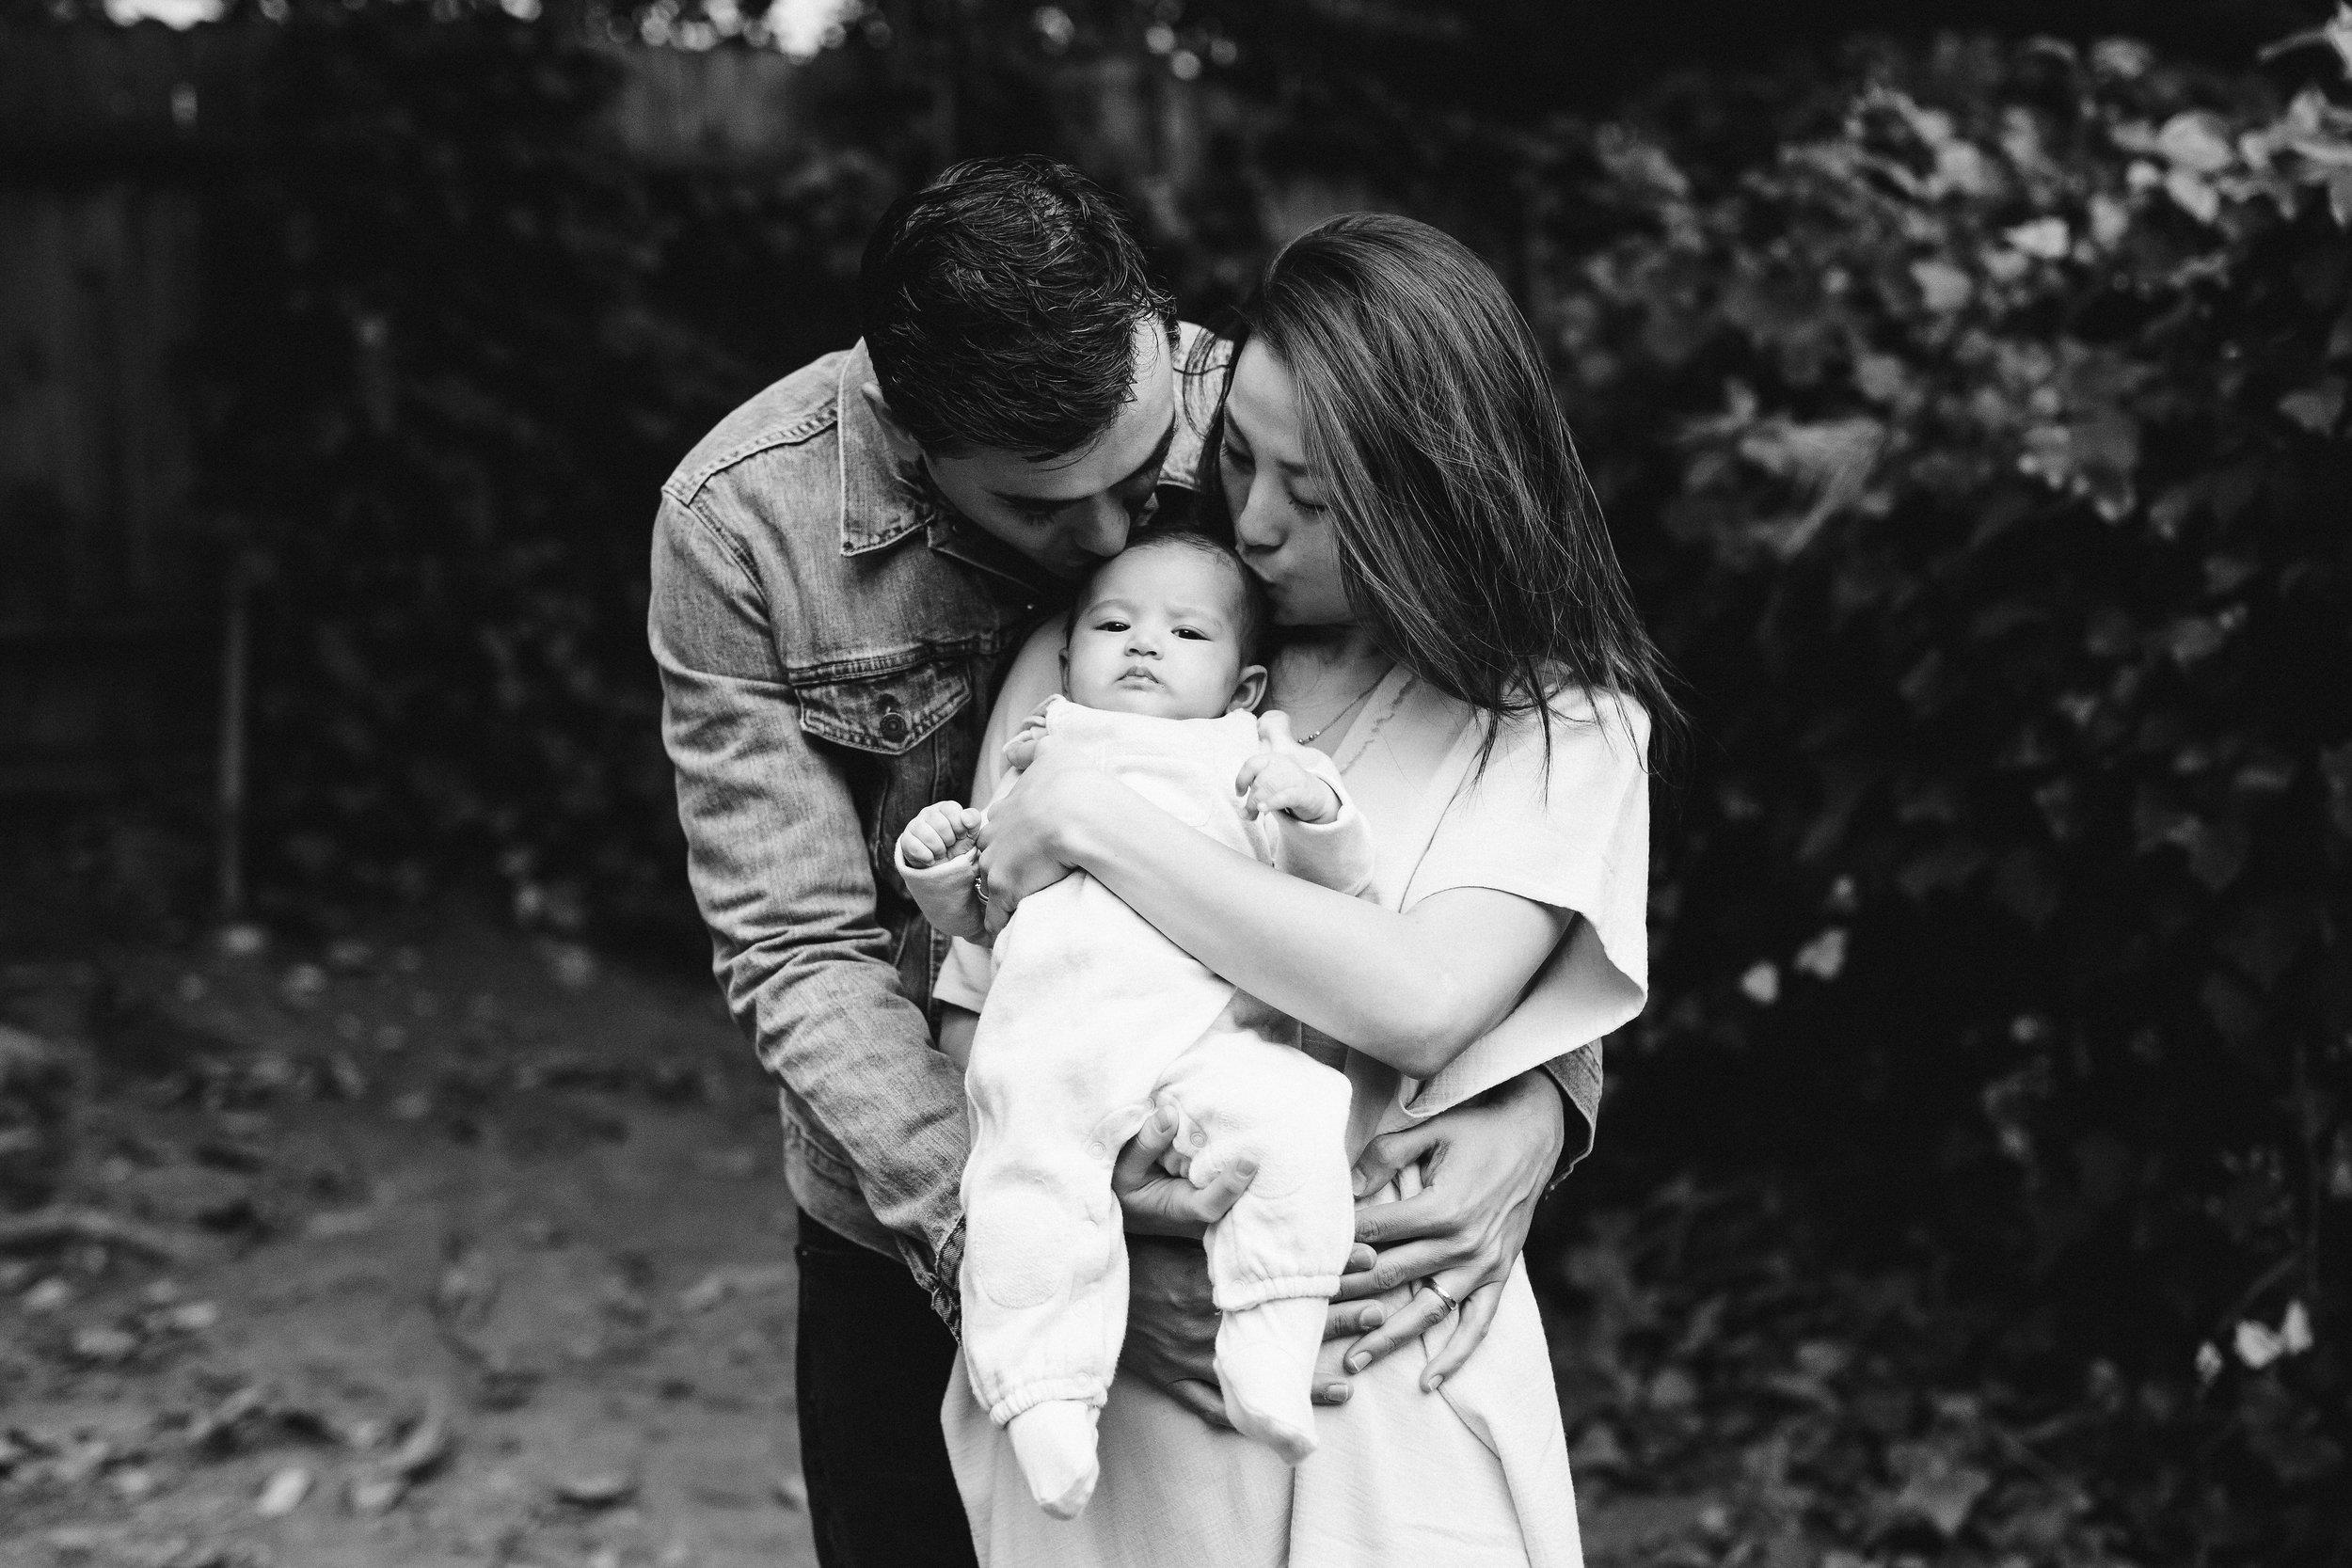 mehana-family-session_la-los-angeles-family-photographer-7-2.jpg